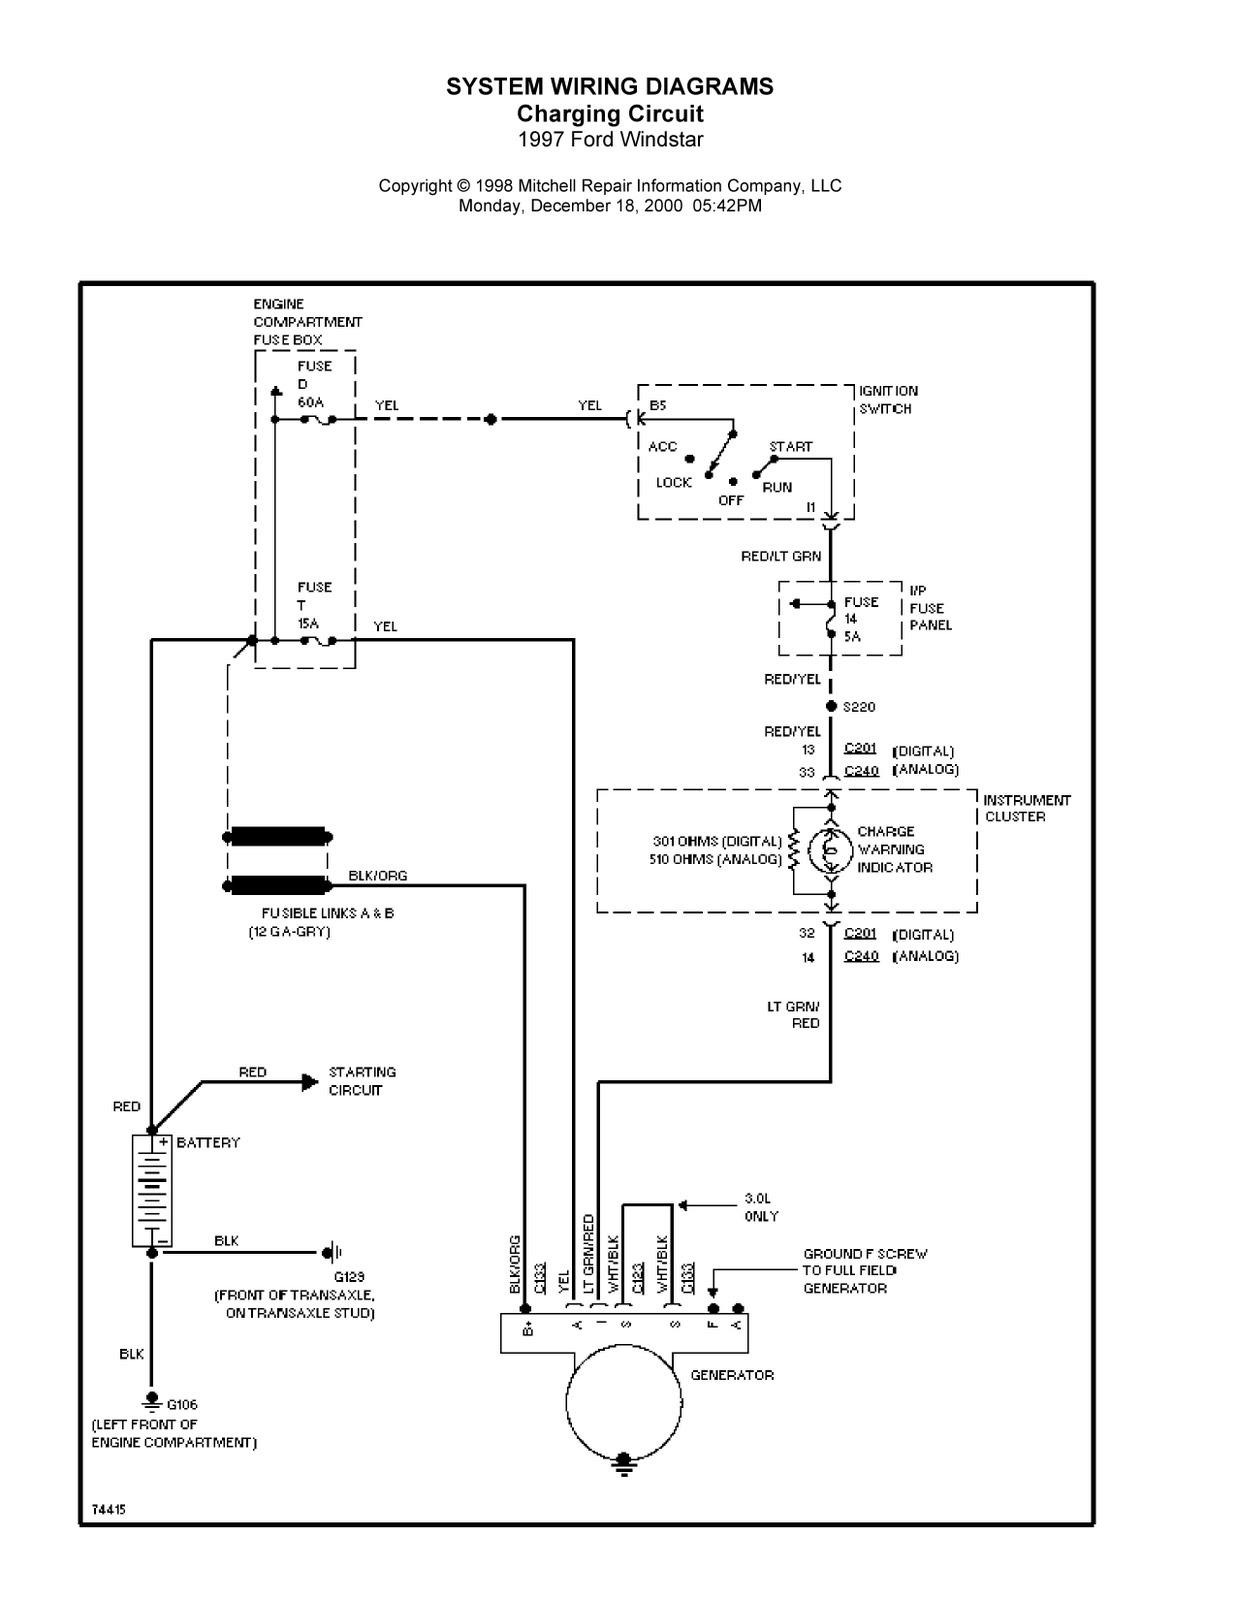 Automotive Diagrams Archives Page 275 Of 301 Wiring - Wiring Diagrams  SchematicAsnières Espaces Verts